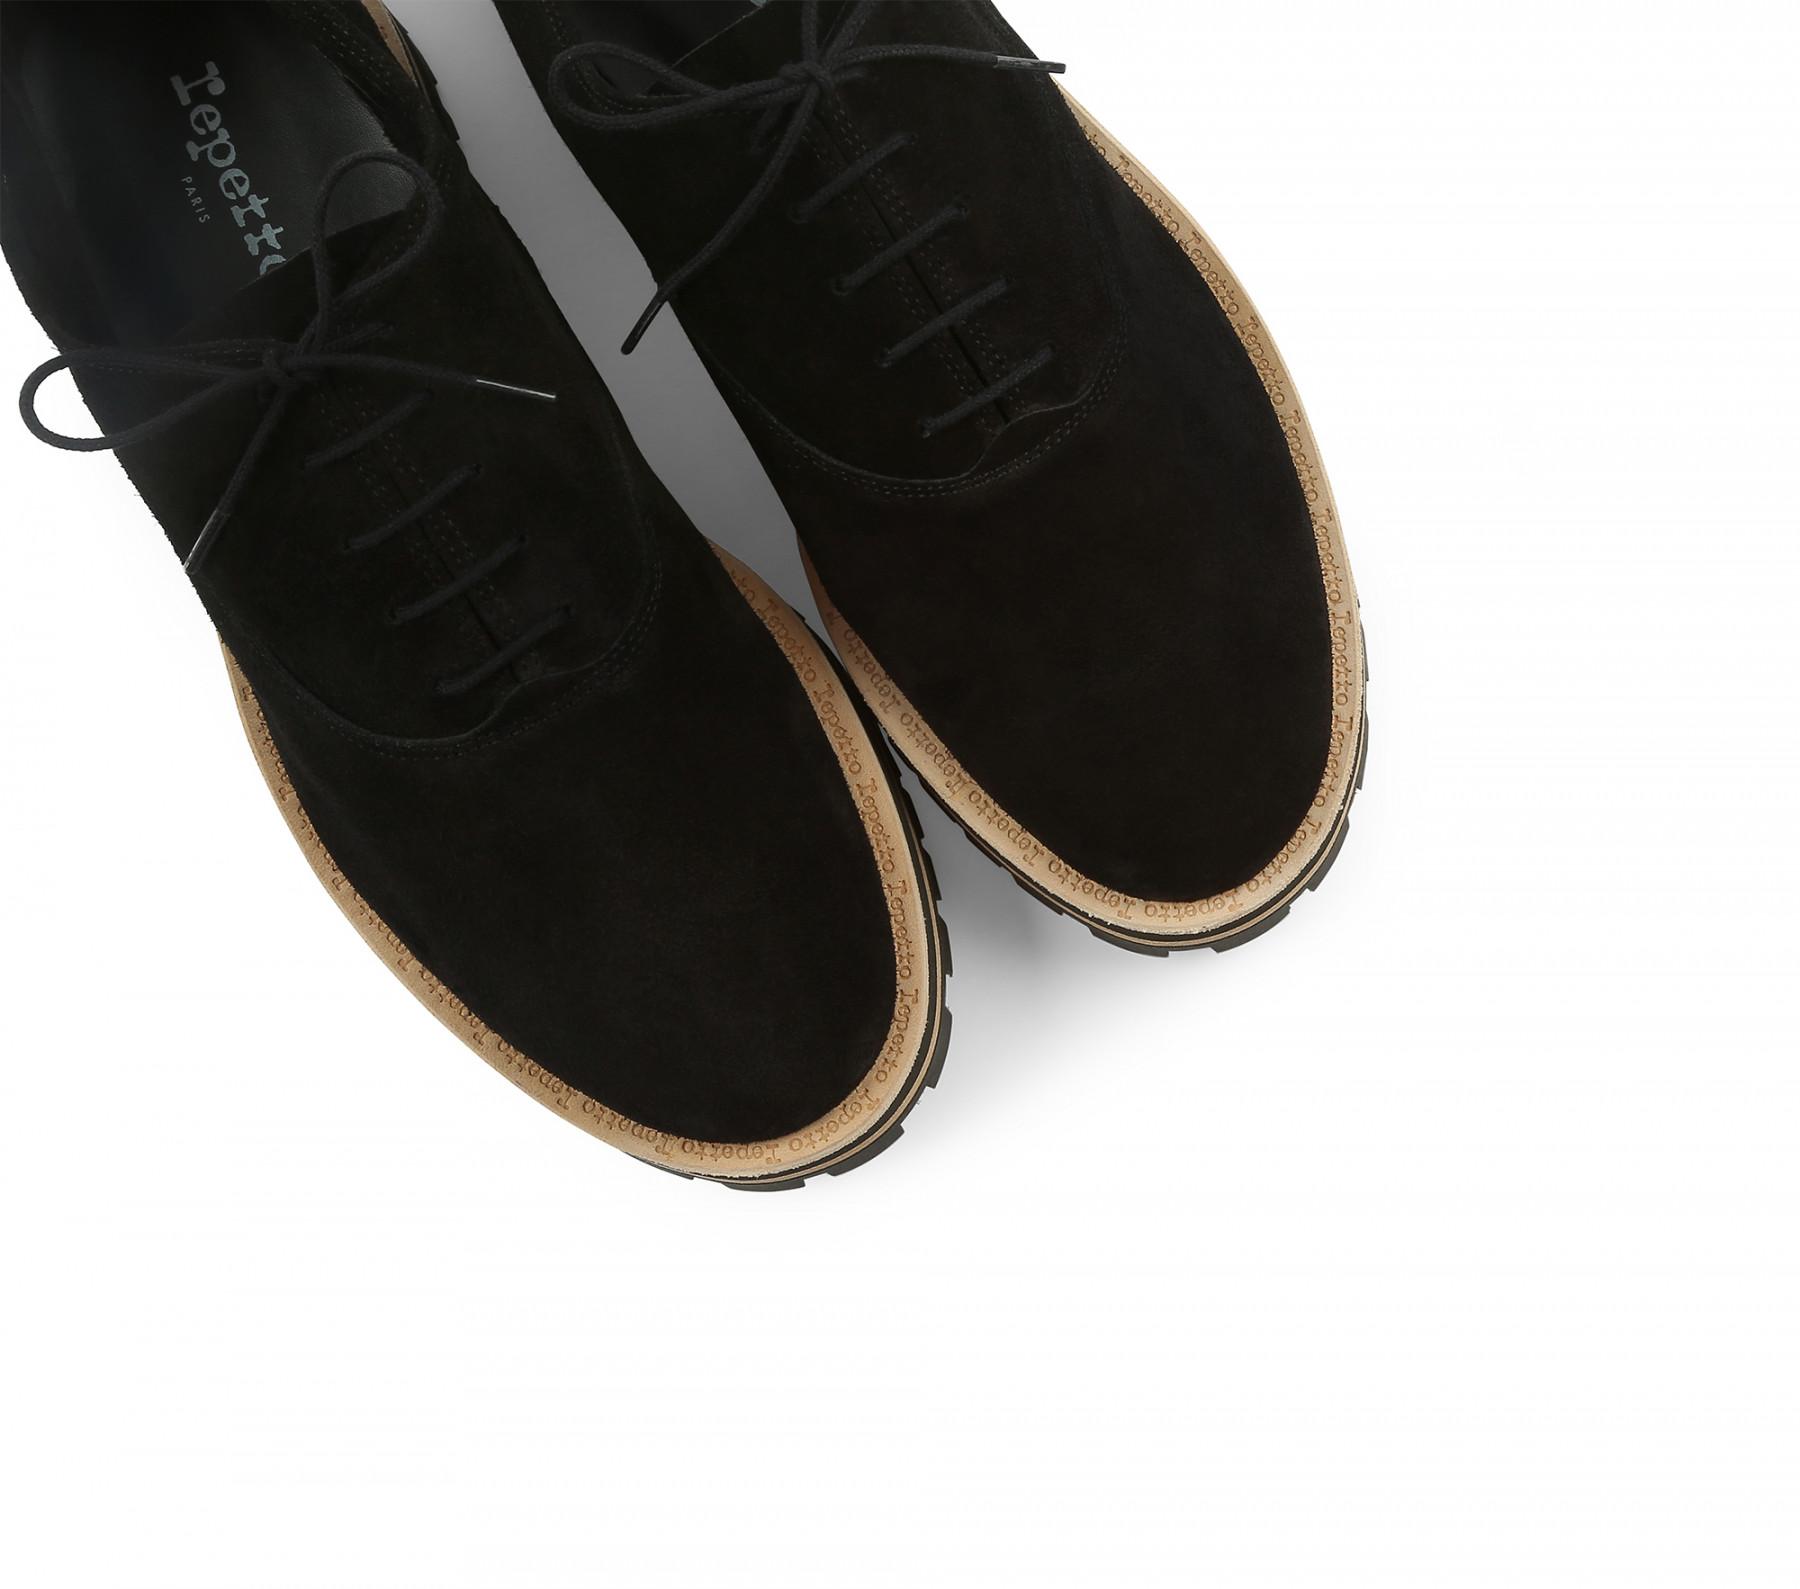 Gianni oxford shoes - Man